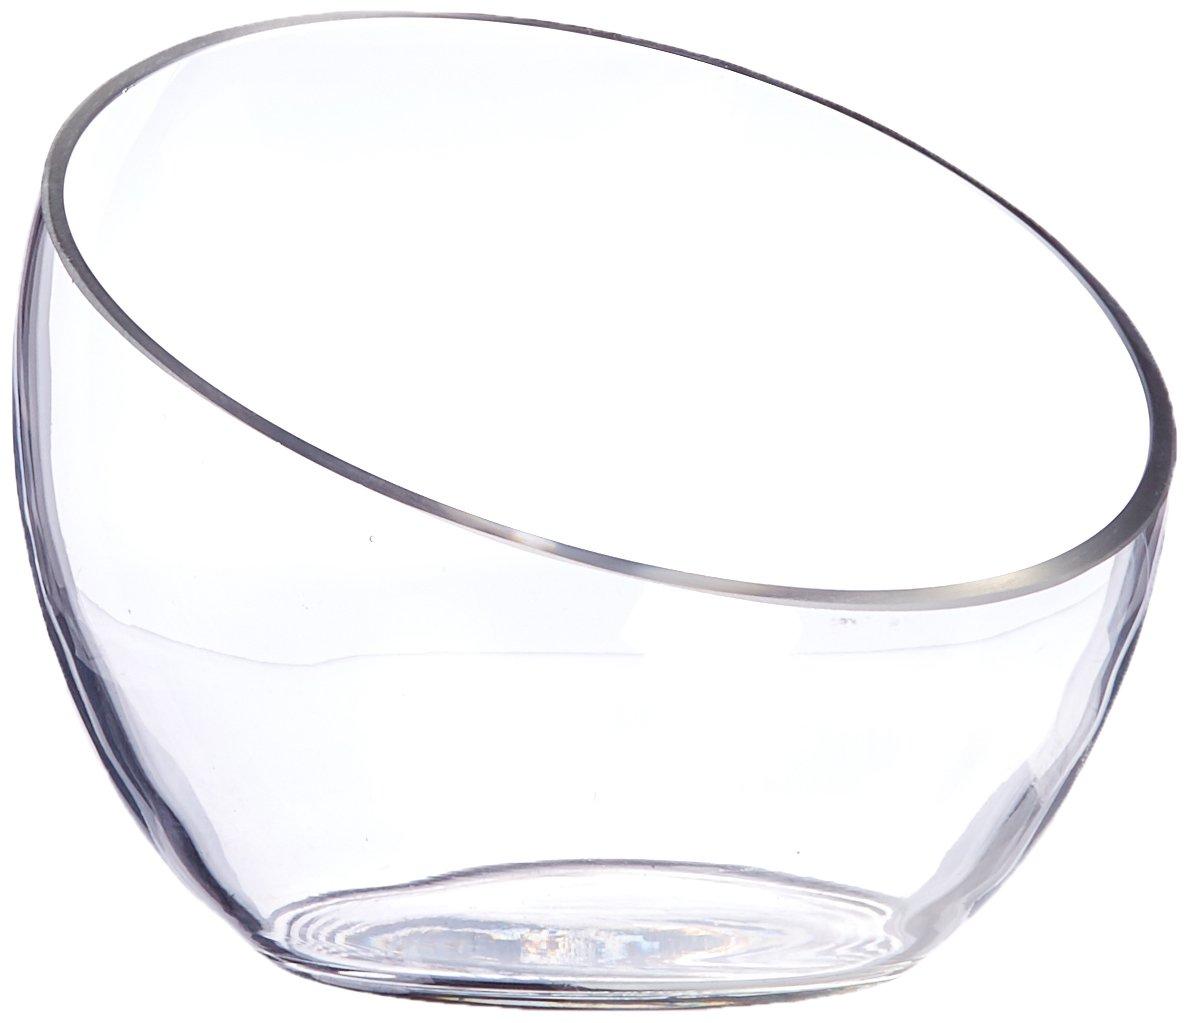 WGV Clear Slant Cut Bowl Glass Vase/Glass Terrarium, 6-Inch x 2.7-Inch GCU063-1PC